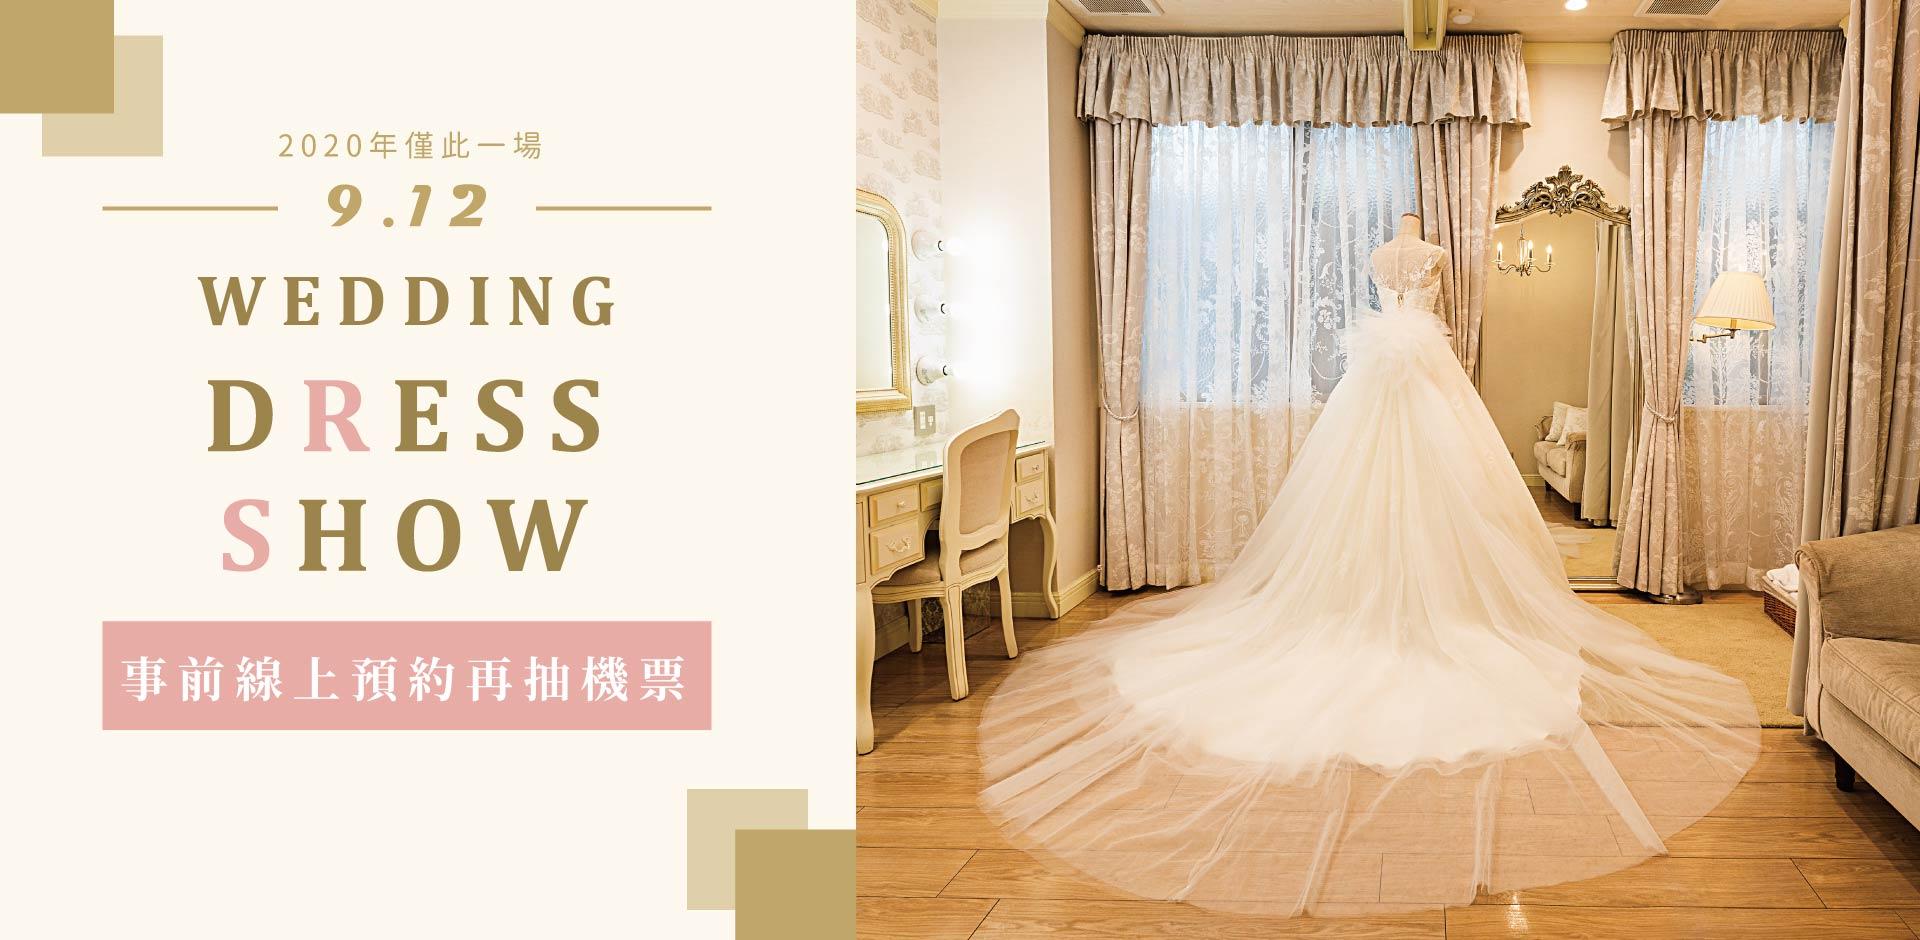 婚紗禮服 show wedding